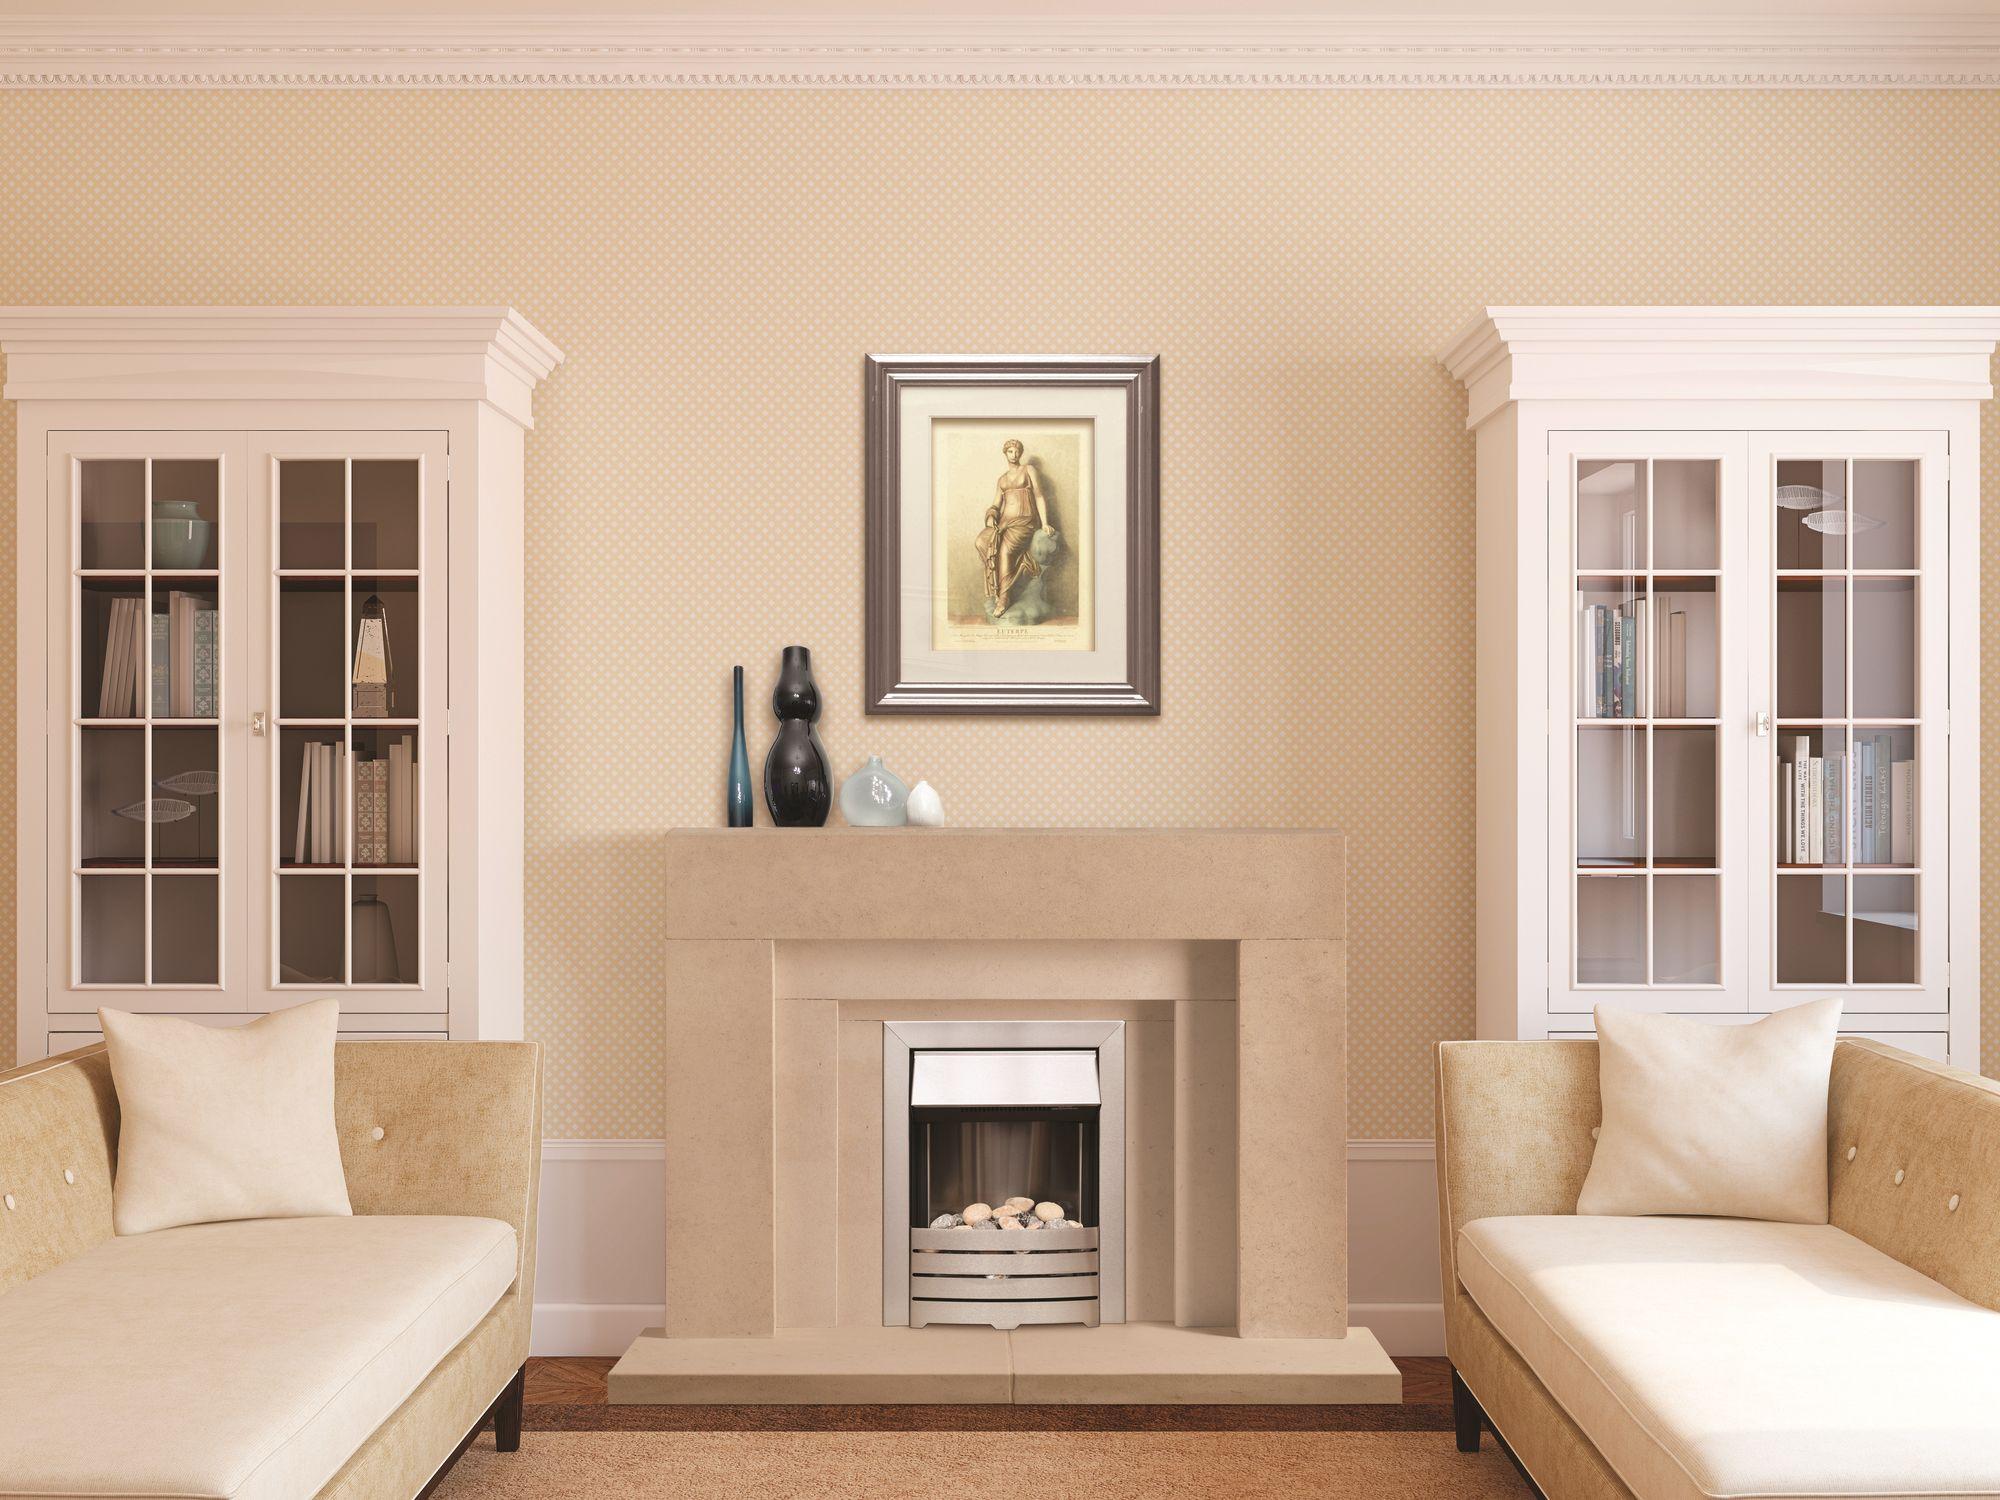 The Wallingford Bathstone Fireplace